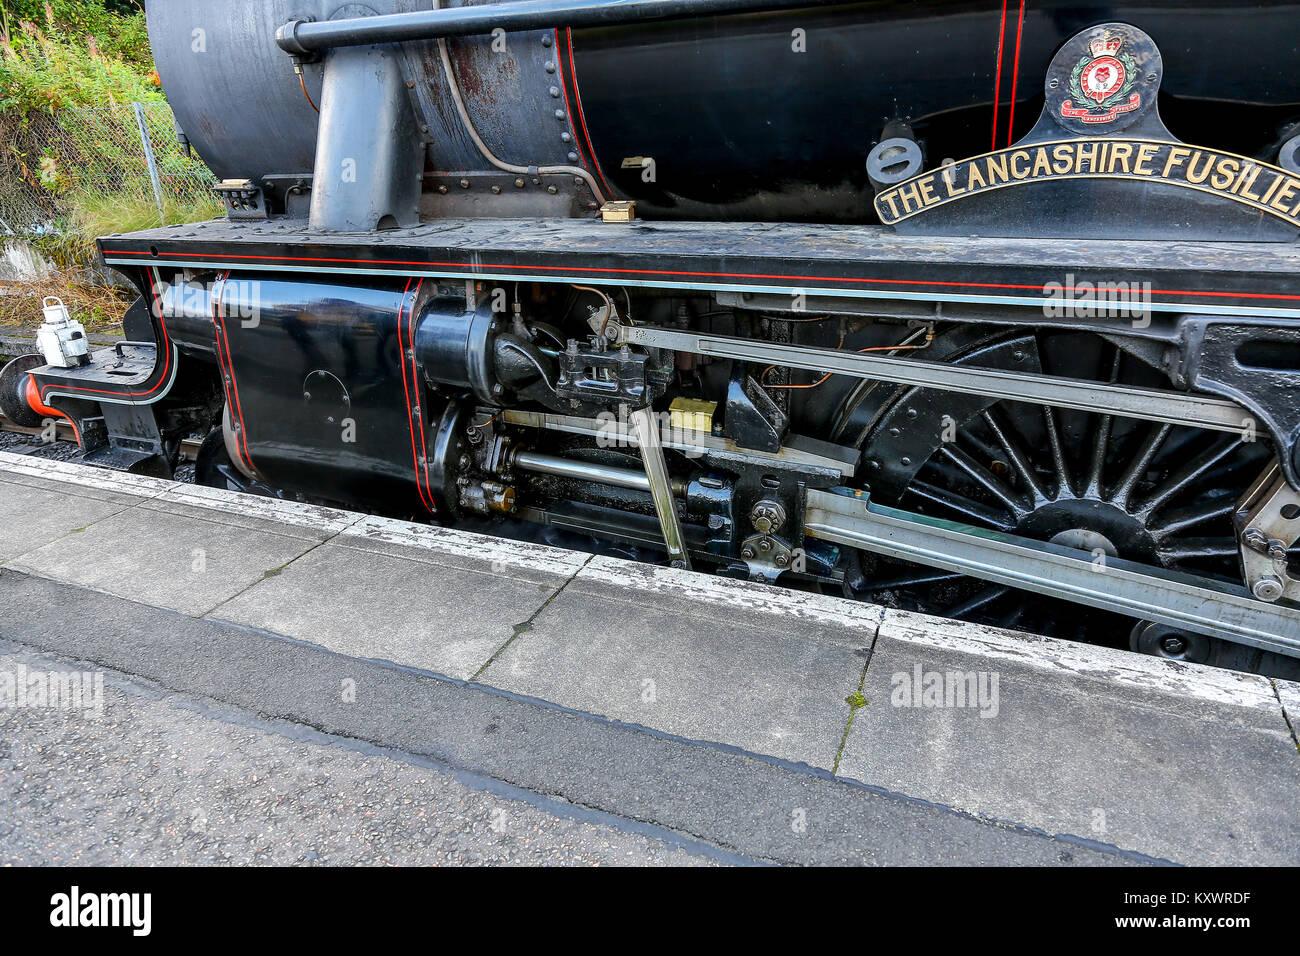 Black 5 Steam LocomotiveStock Photos and Images